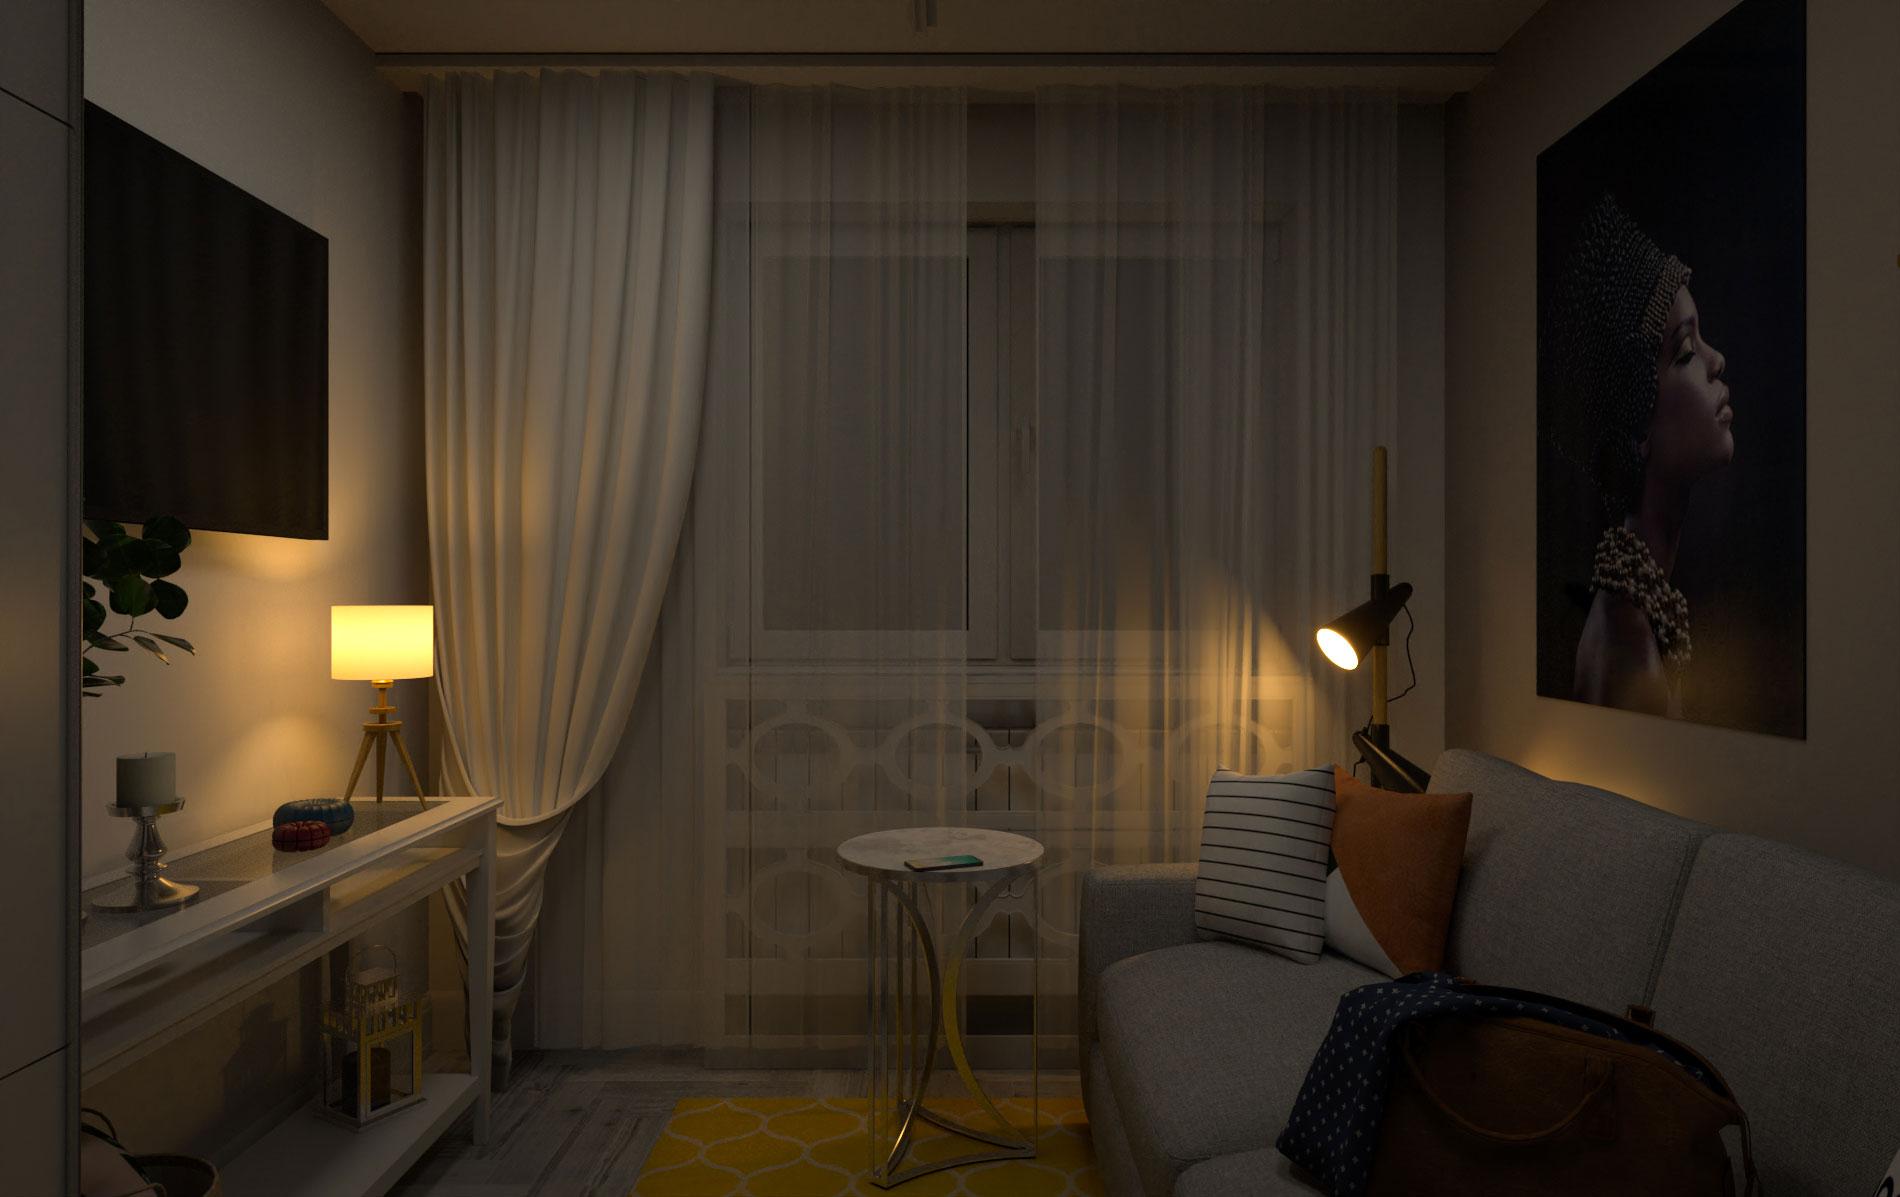 Bedroom night scene